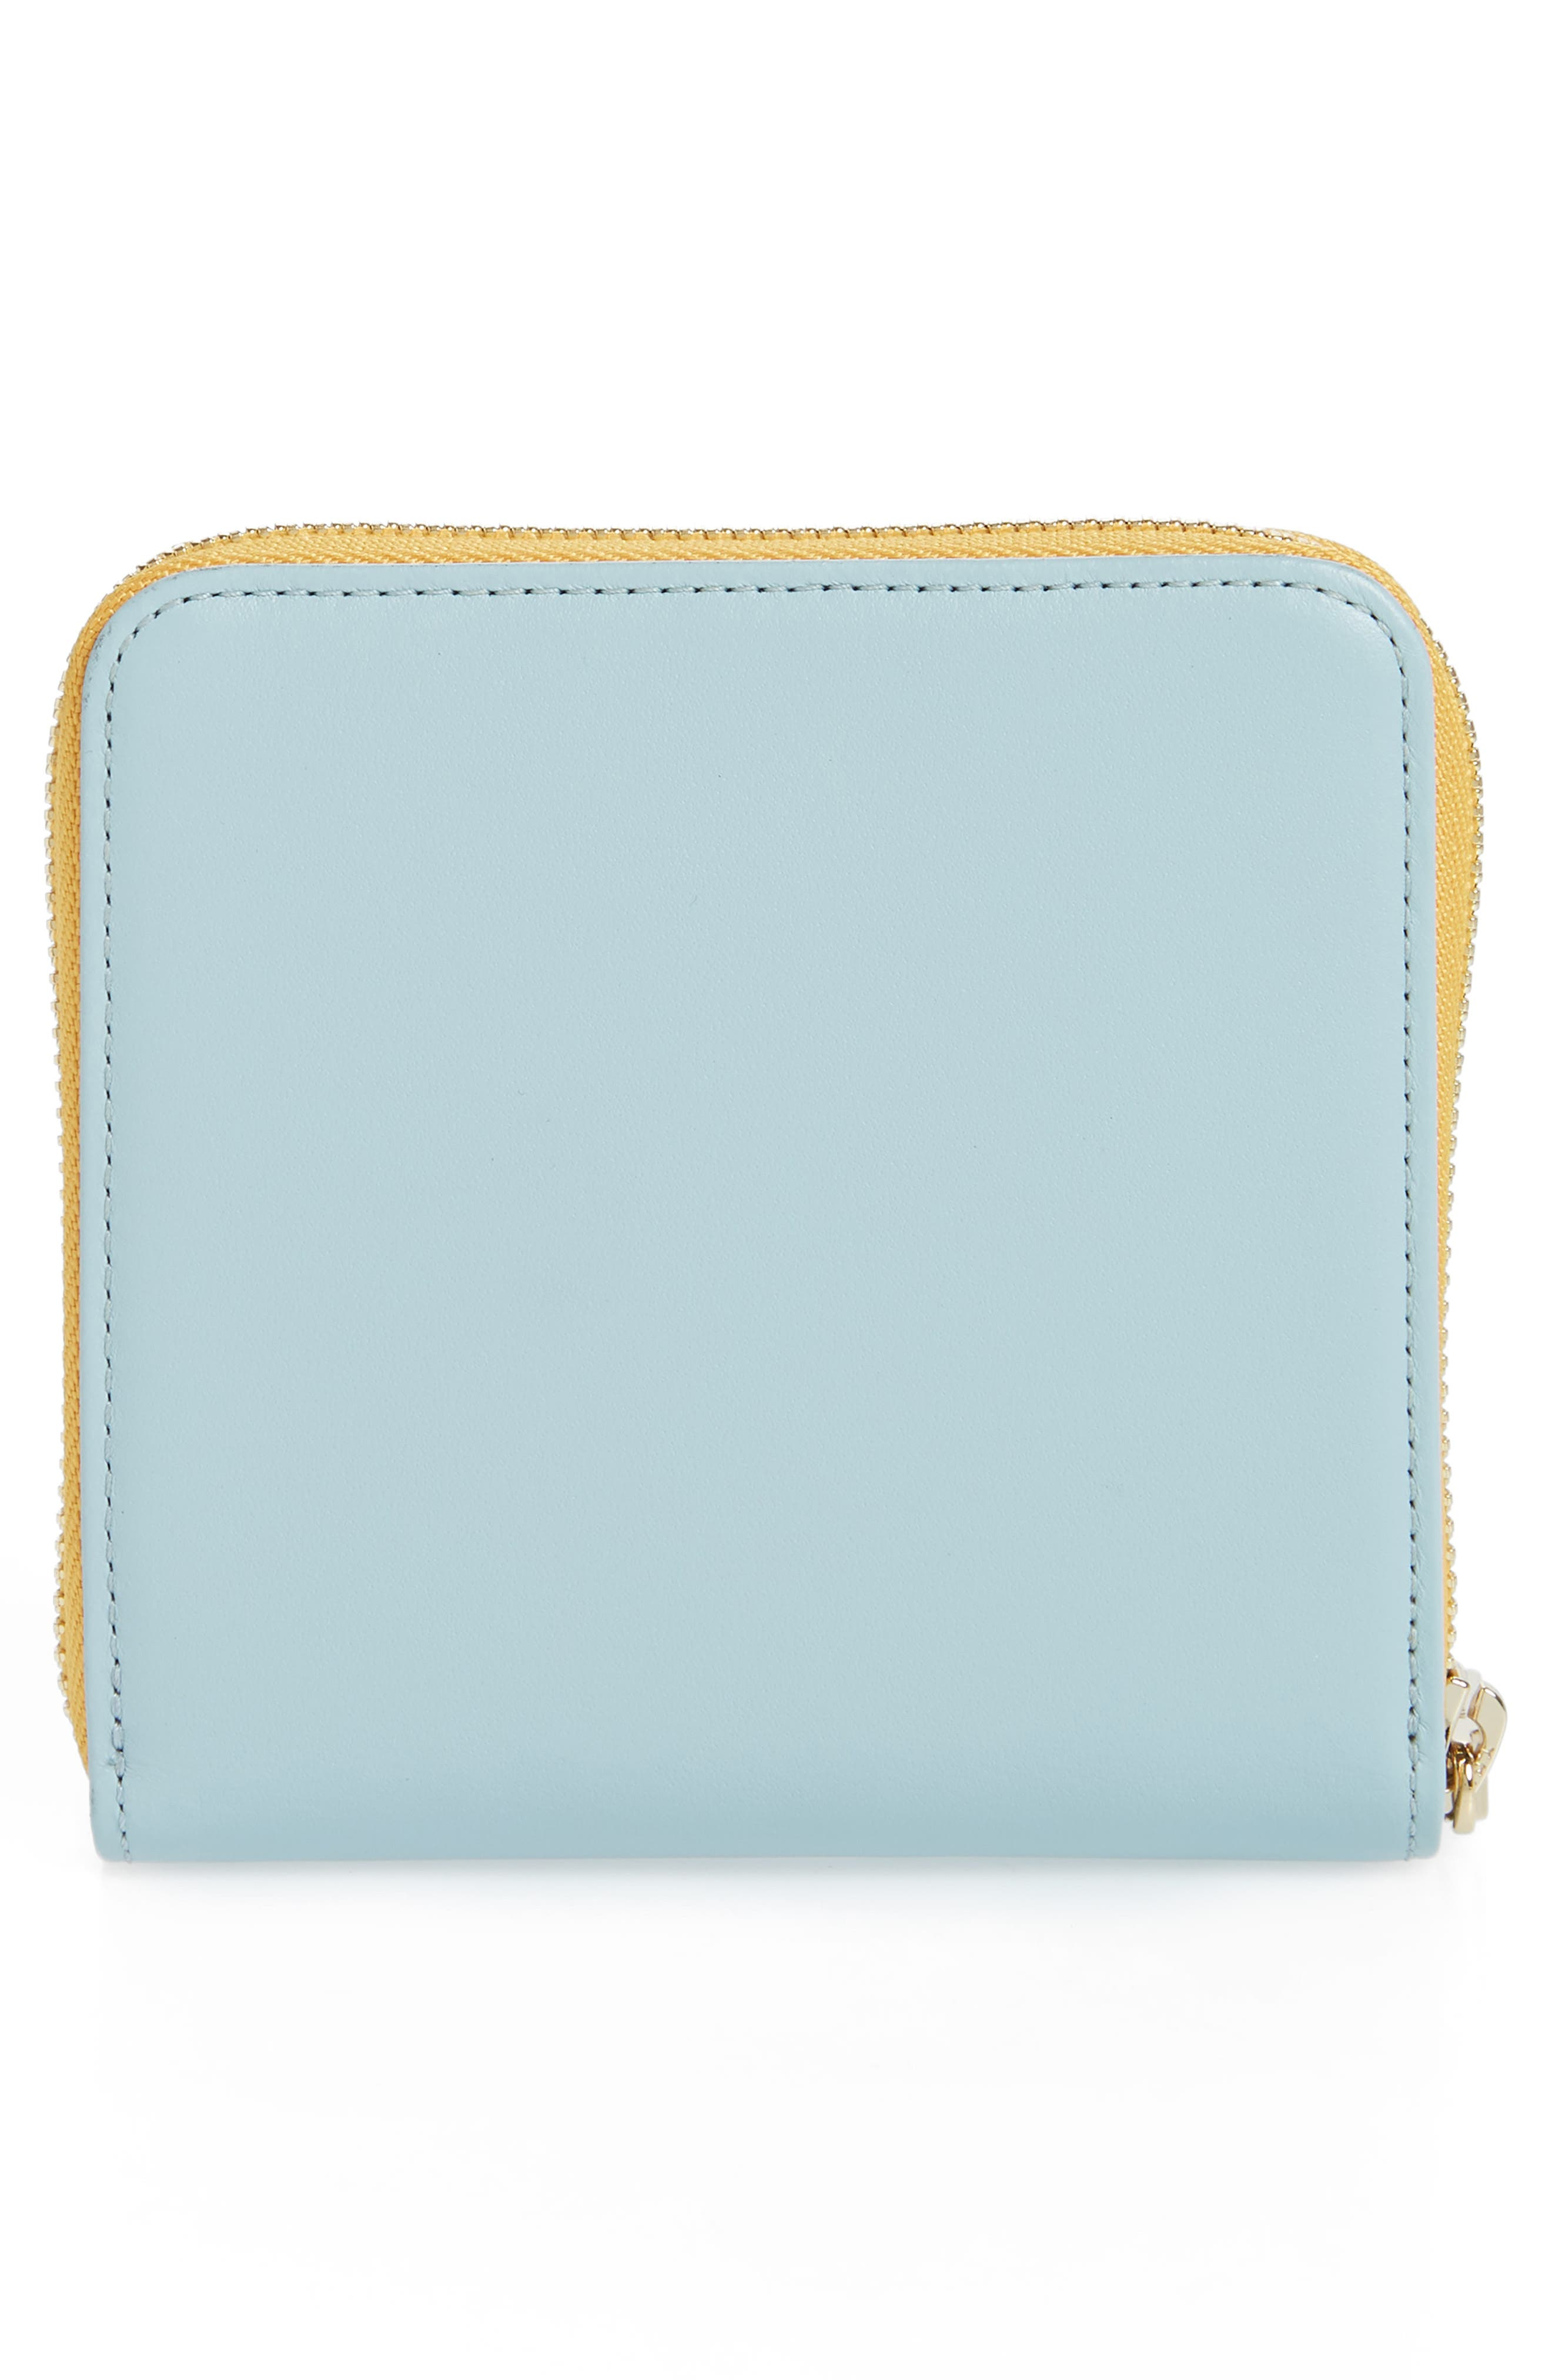 Half Zip Carryall Wallet,                             Alternate thumbnail 4, color,                             CLOUD BLUE/ HONEY